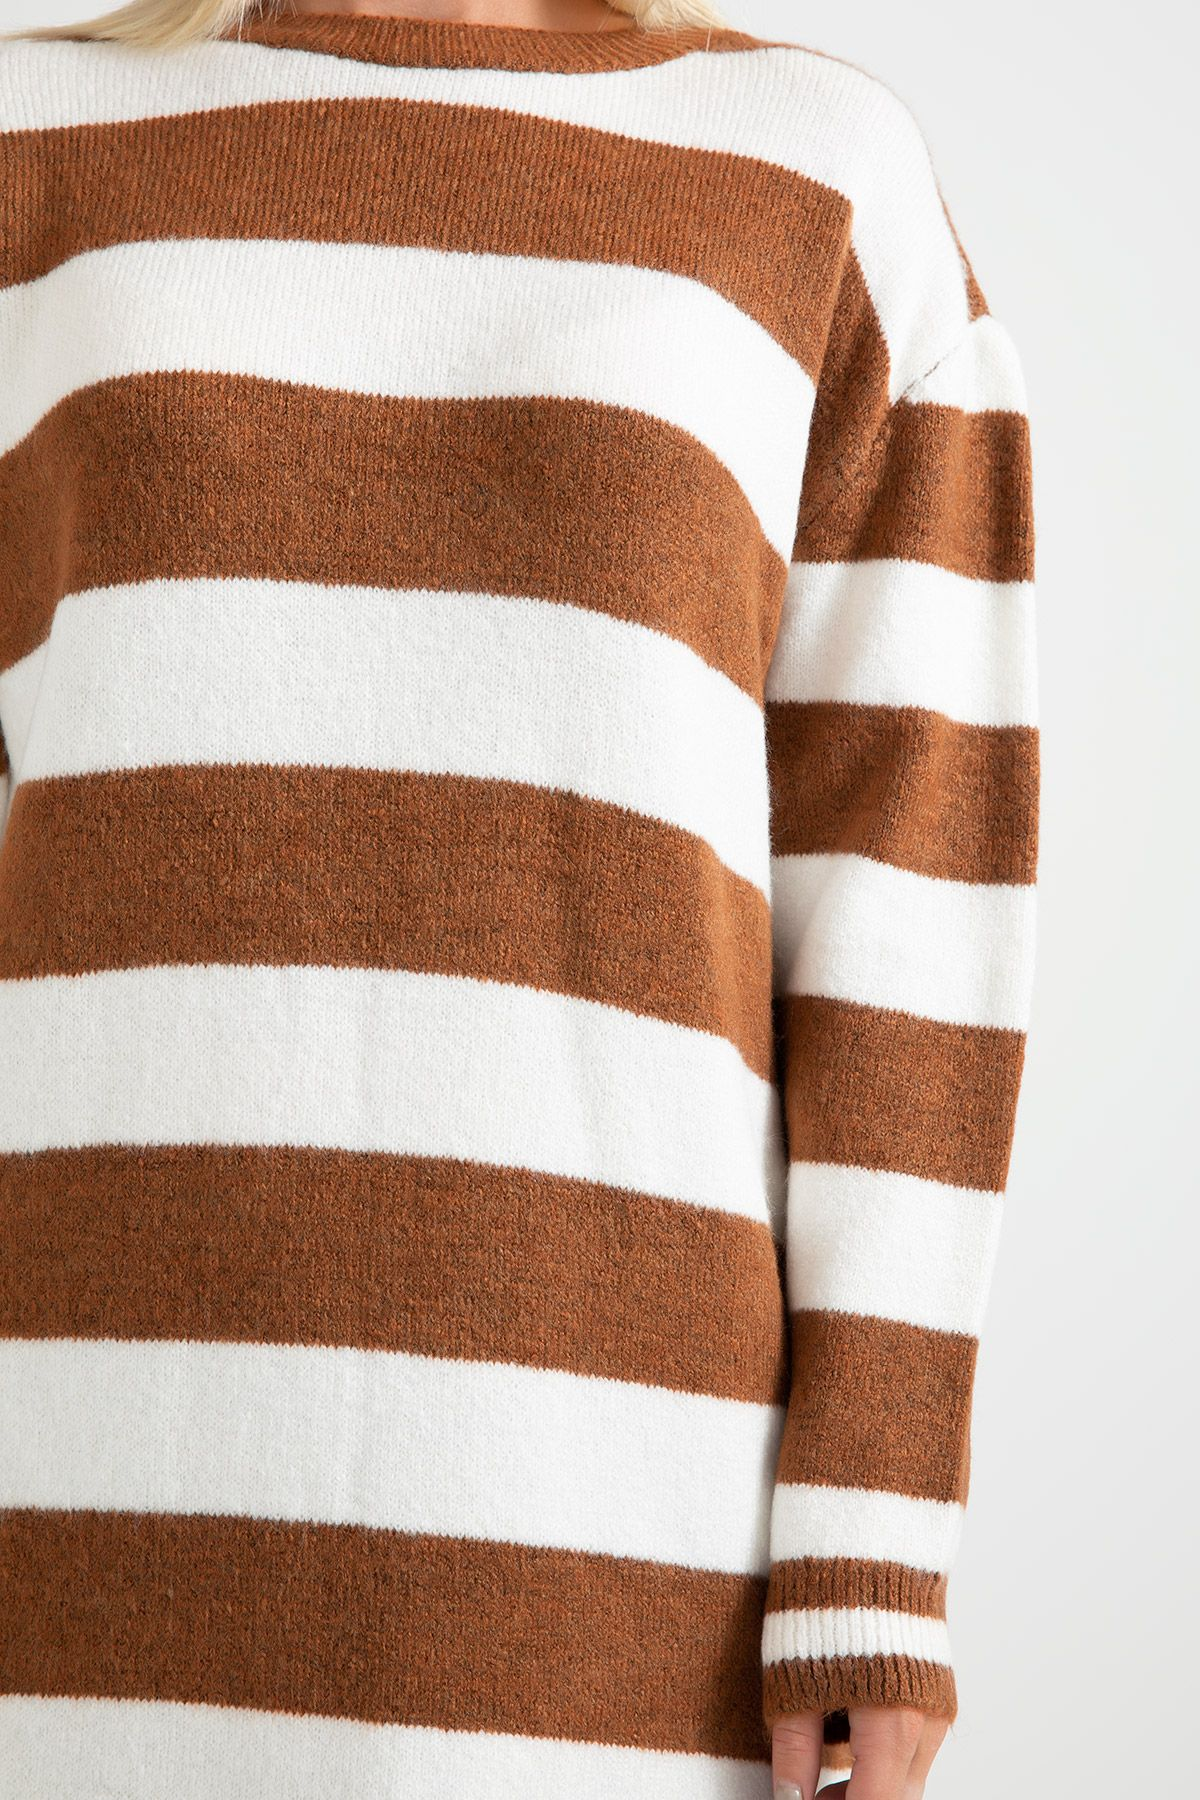 Knitwear - Tunic -Light Brown